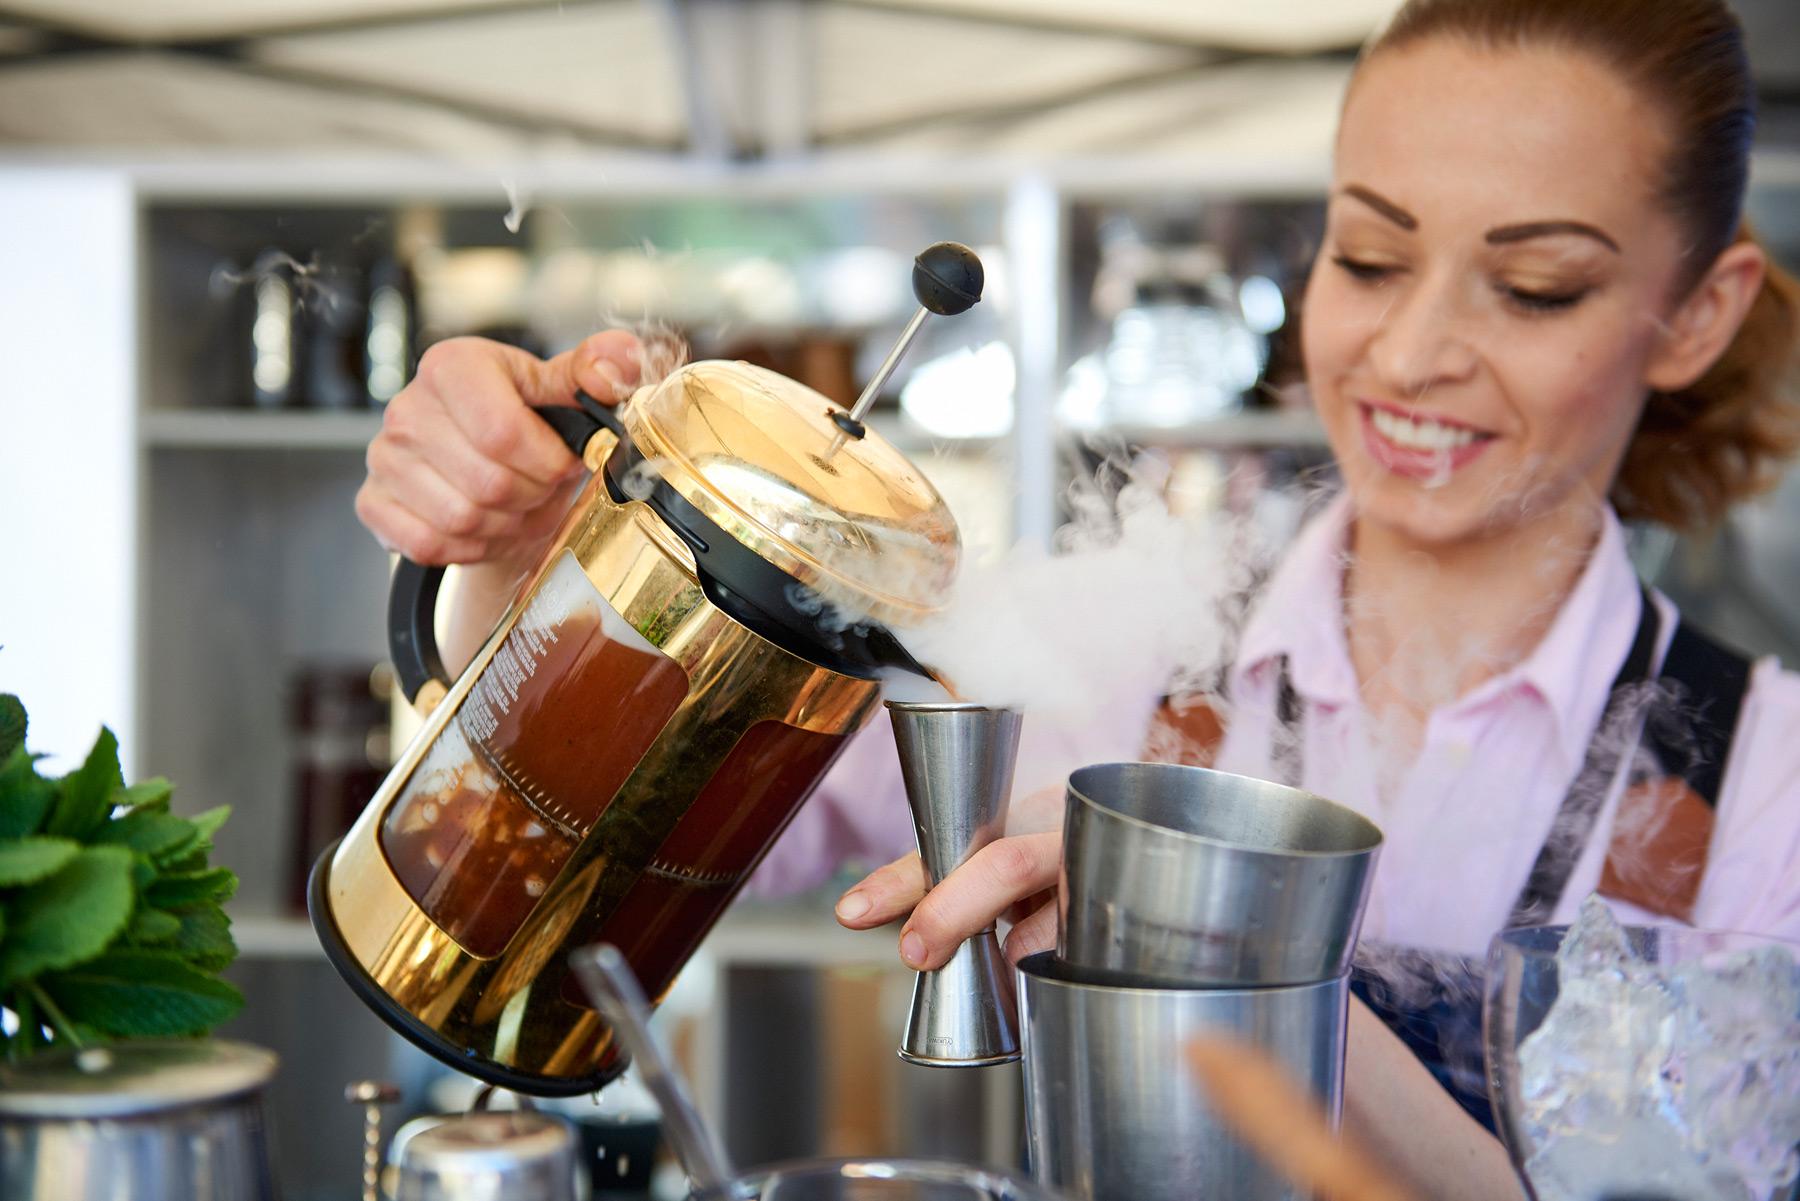 11 Luxury Gadgets Every Coffee Lover Needs